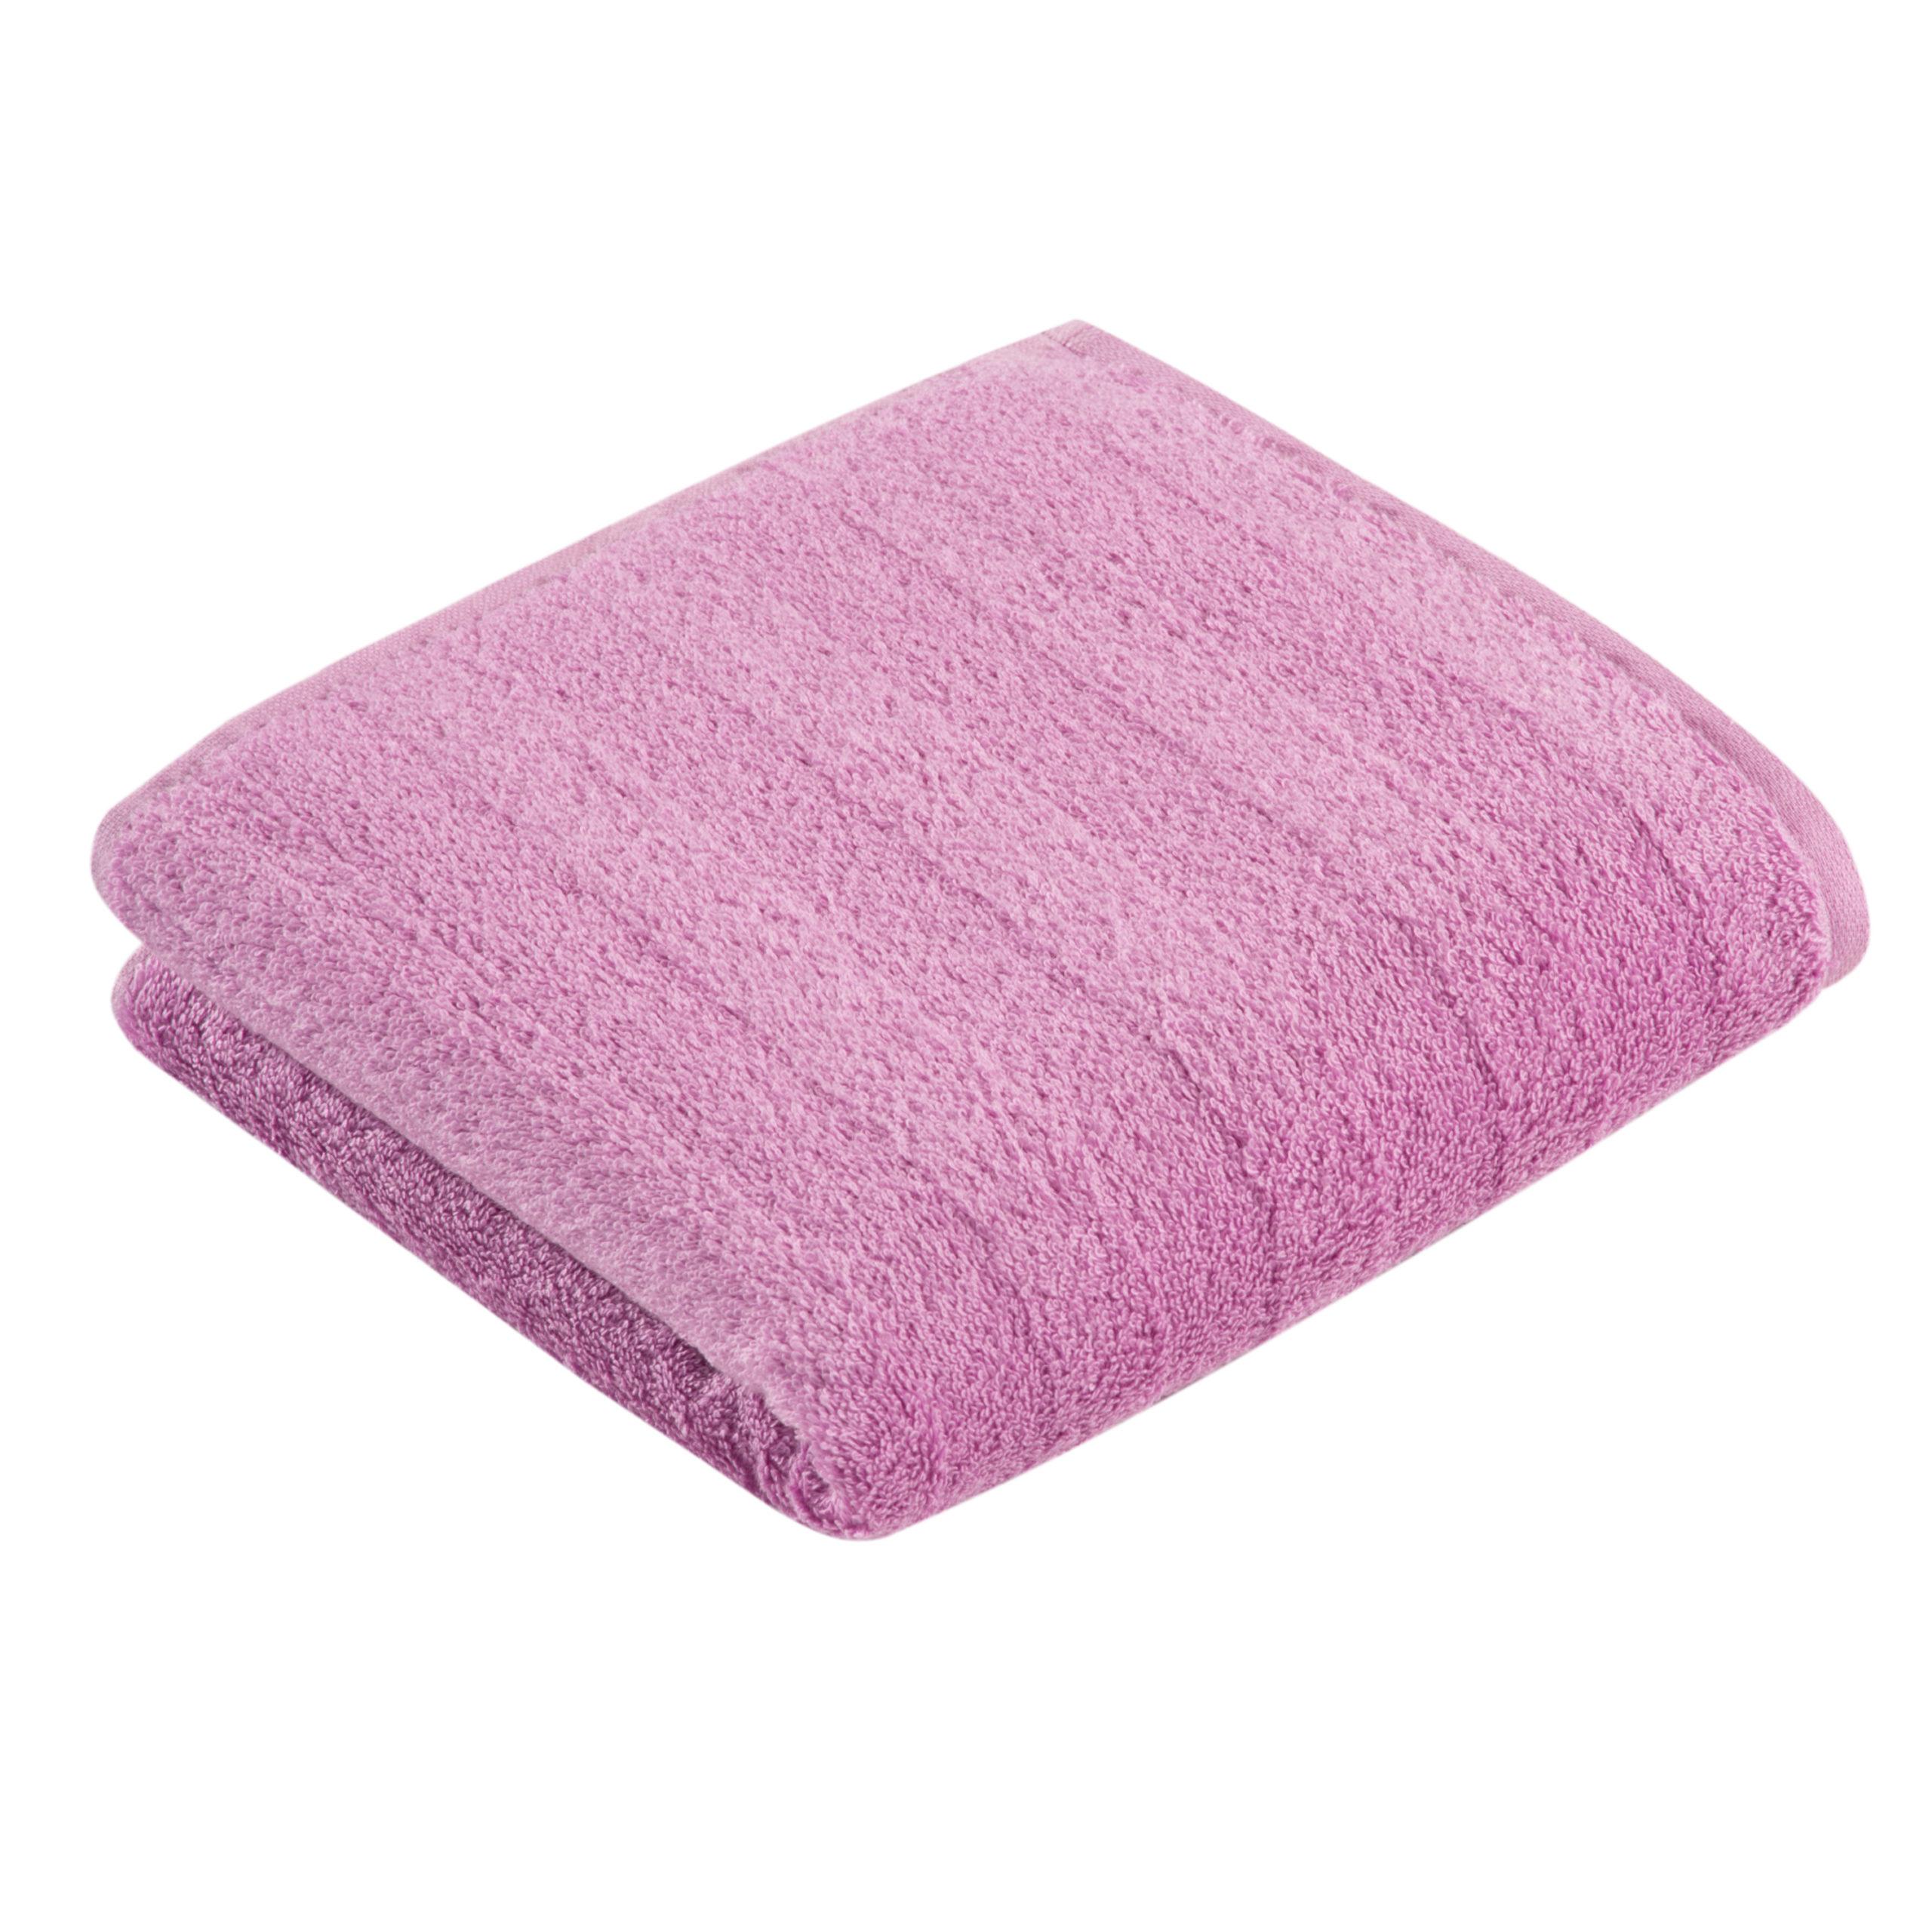 Vossen ręcznik fresh 843 hot lilac